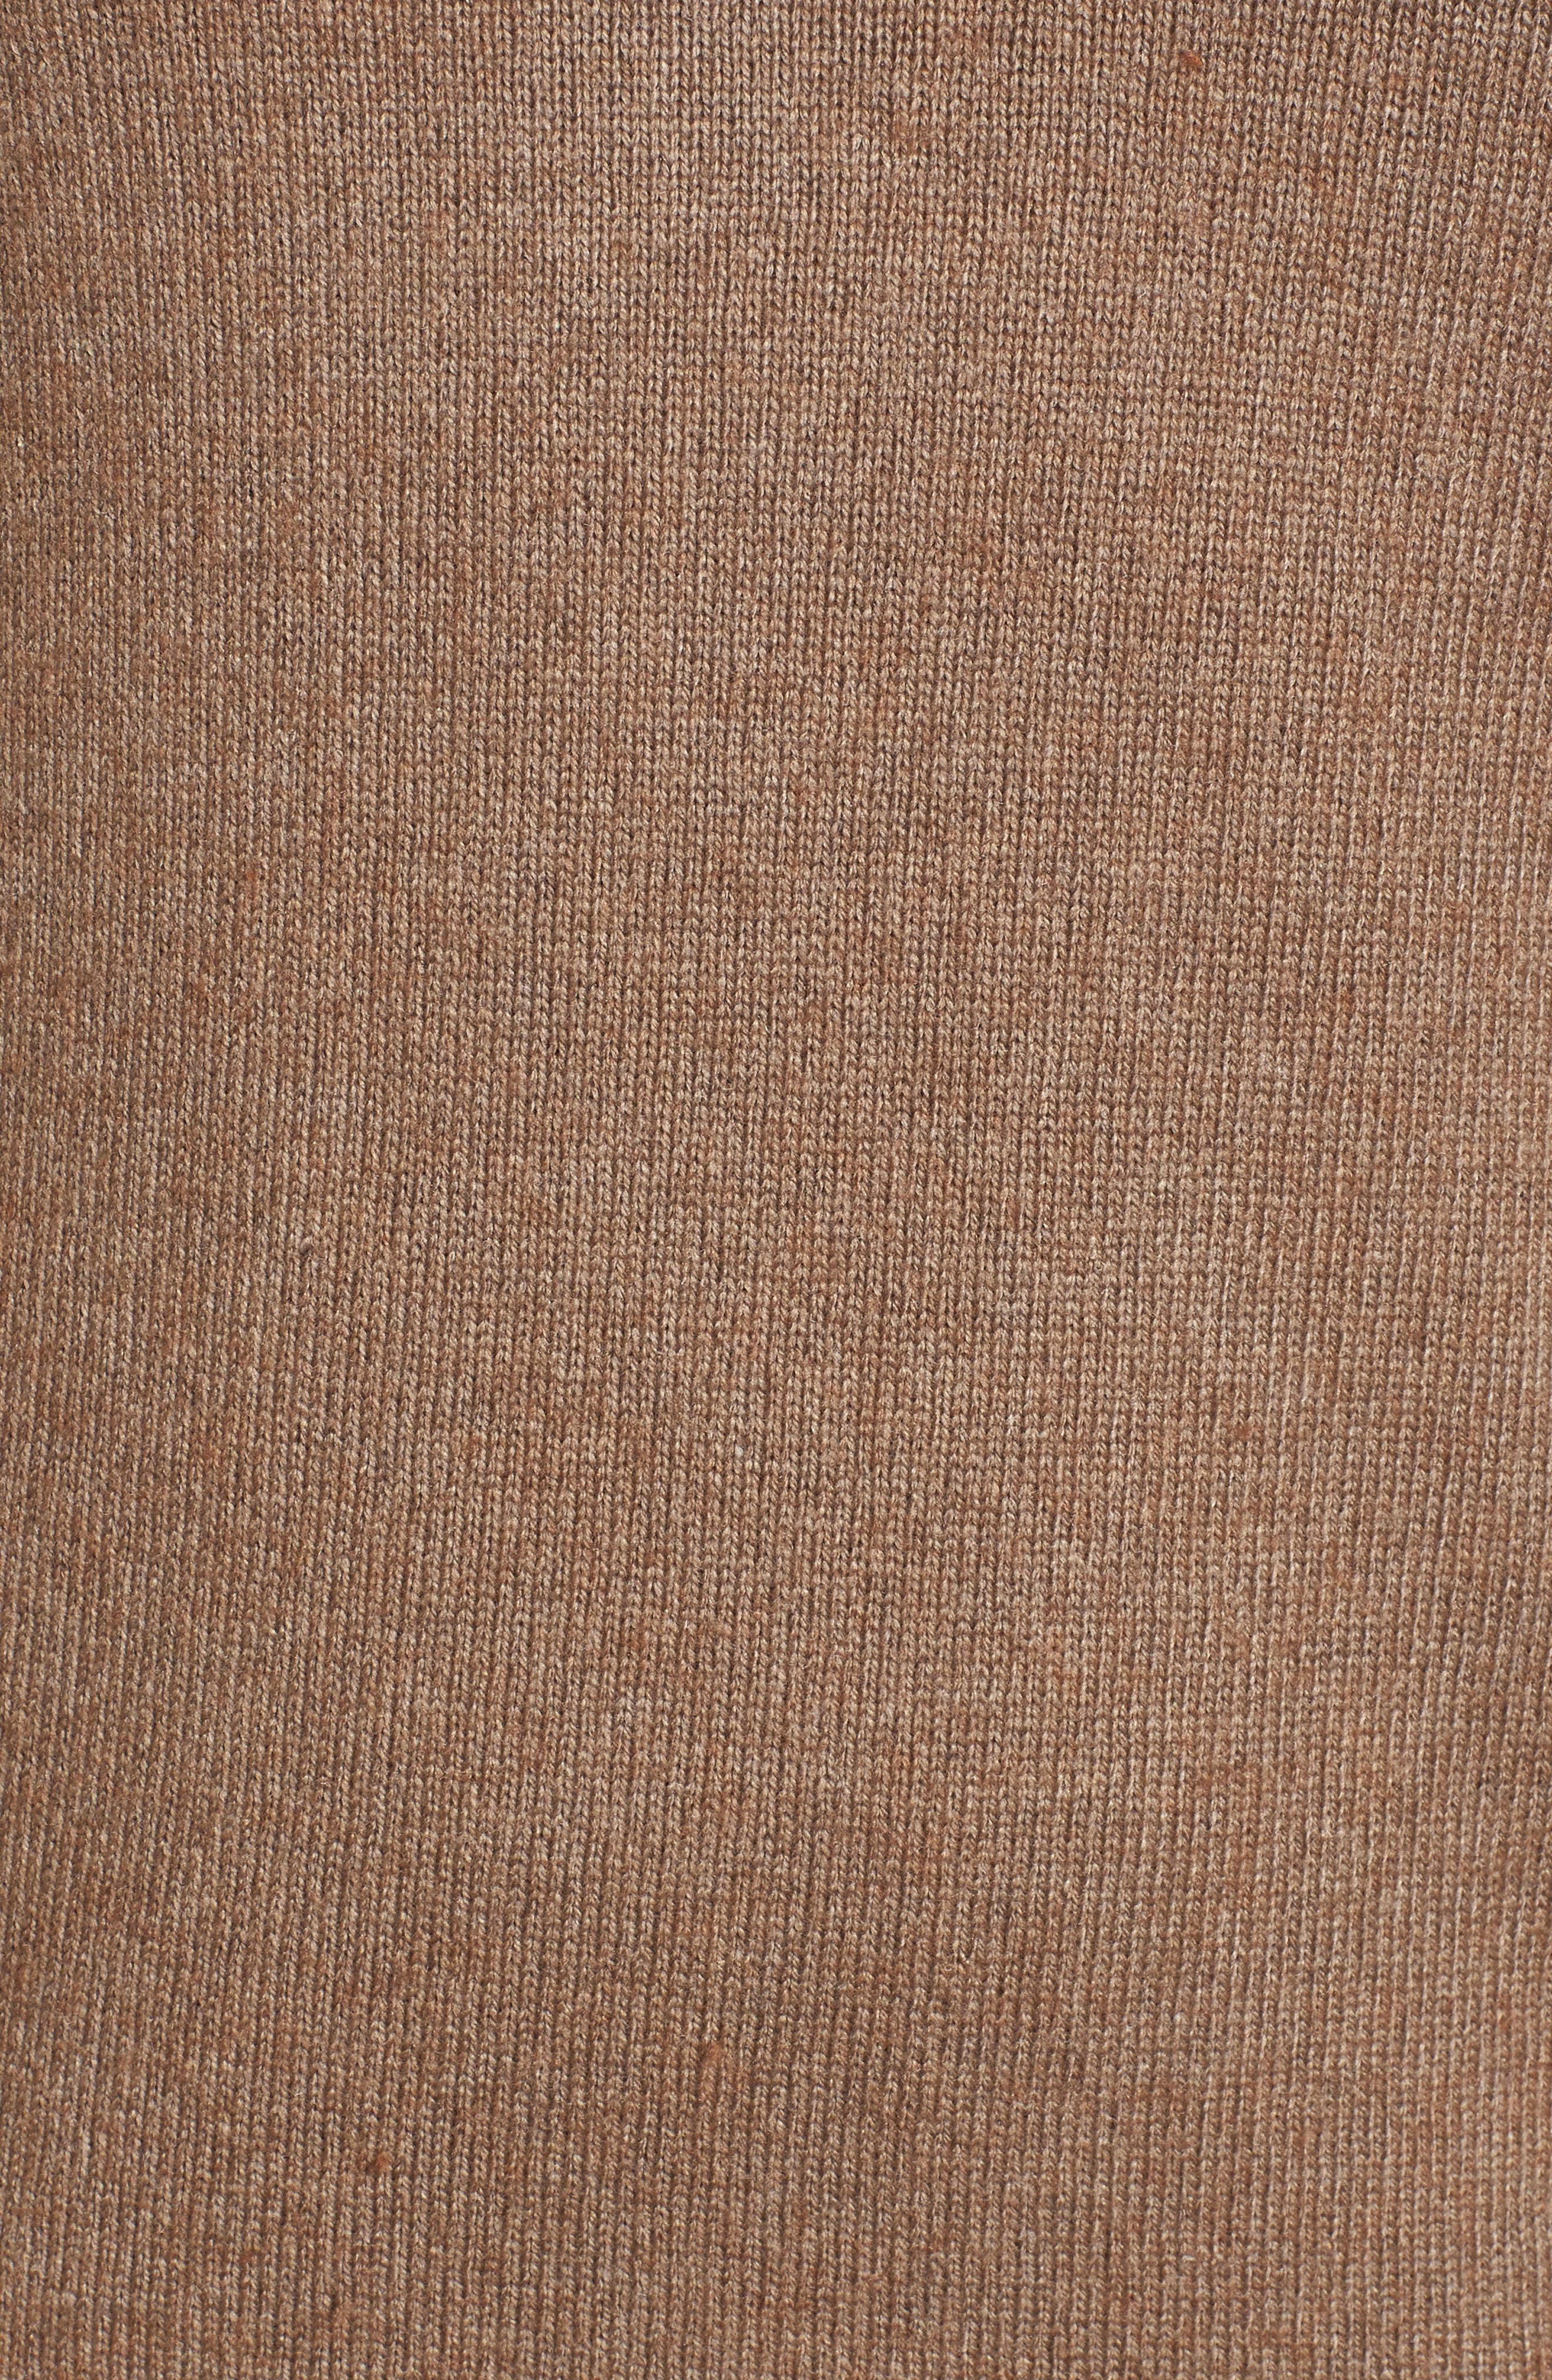 Mix Stitch Turtleneck Sweater,                             Alternate thumbnail 5, color,                             261